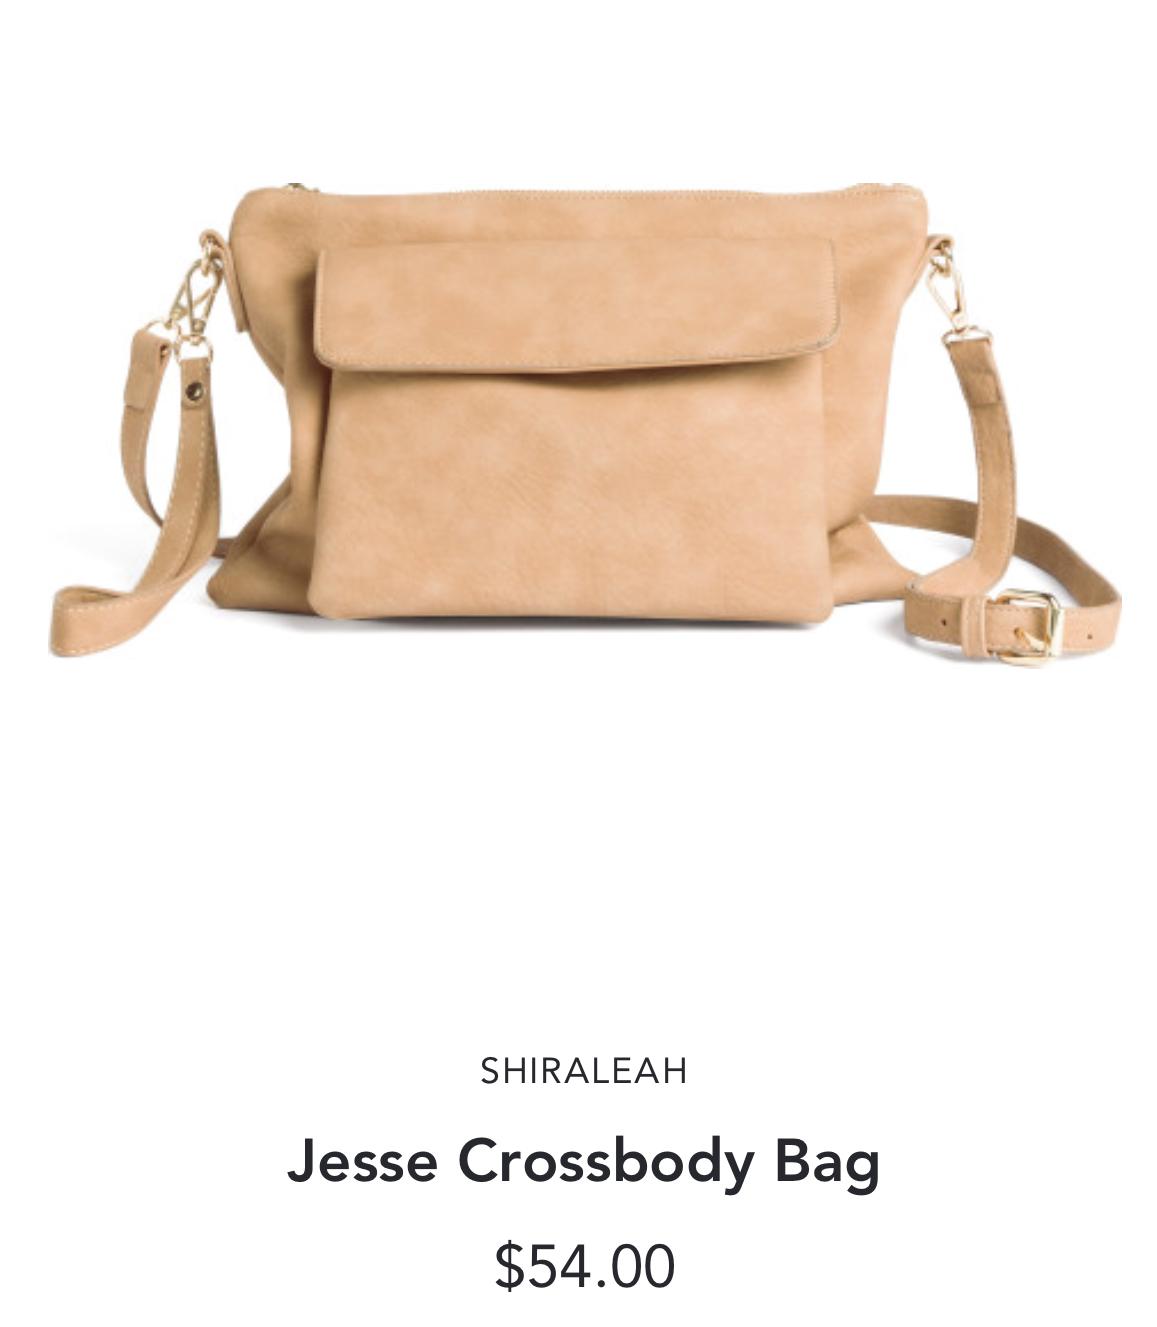 Stitch Fix Shiraleah Jesse Crossbody Bag